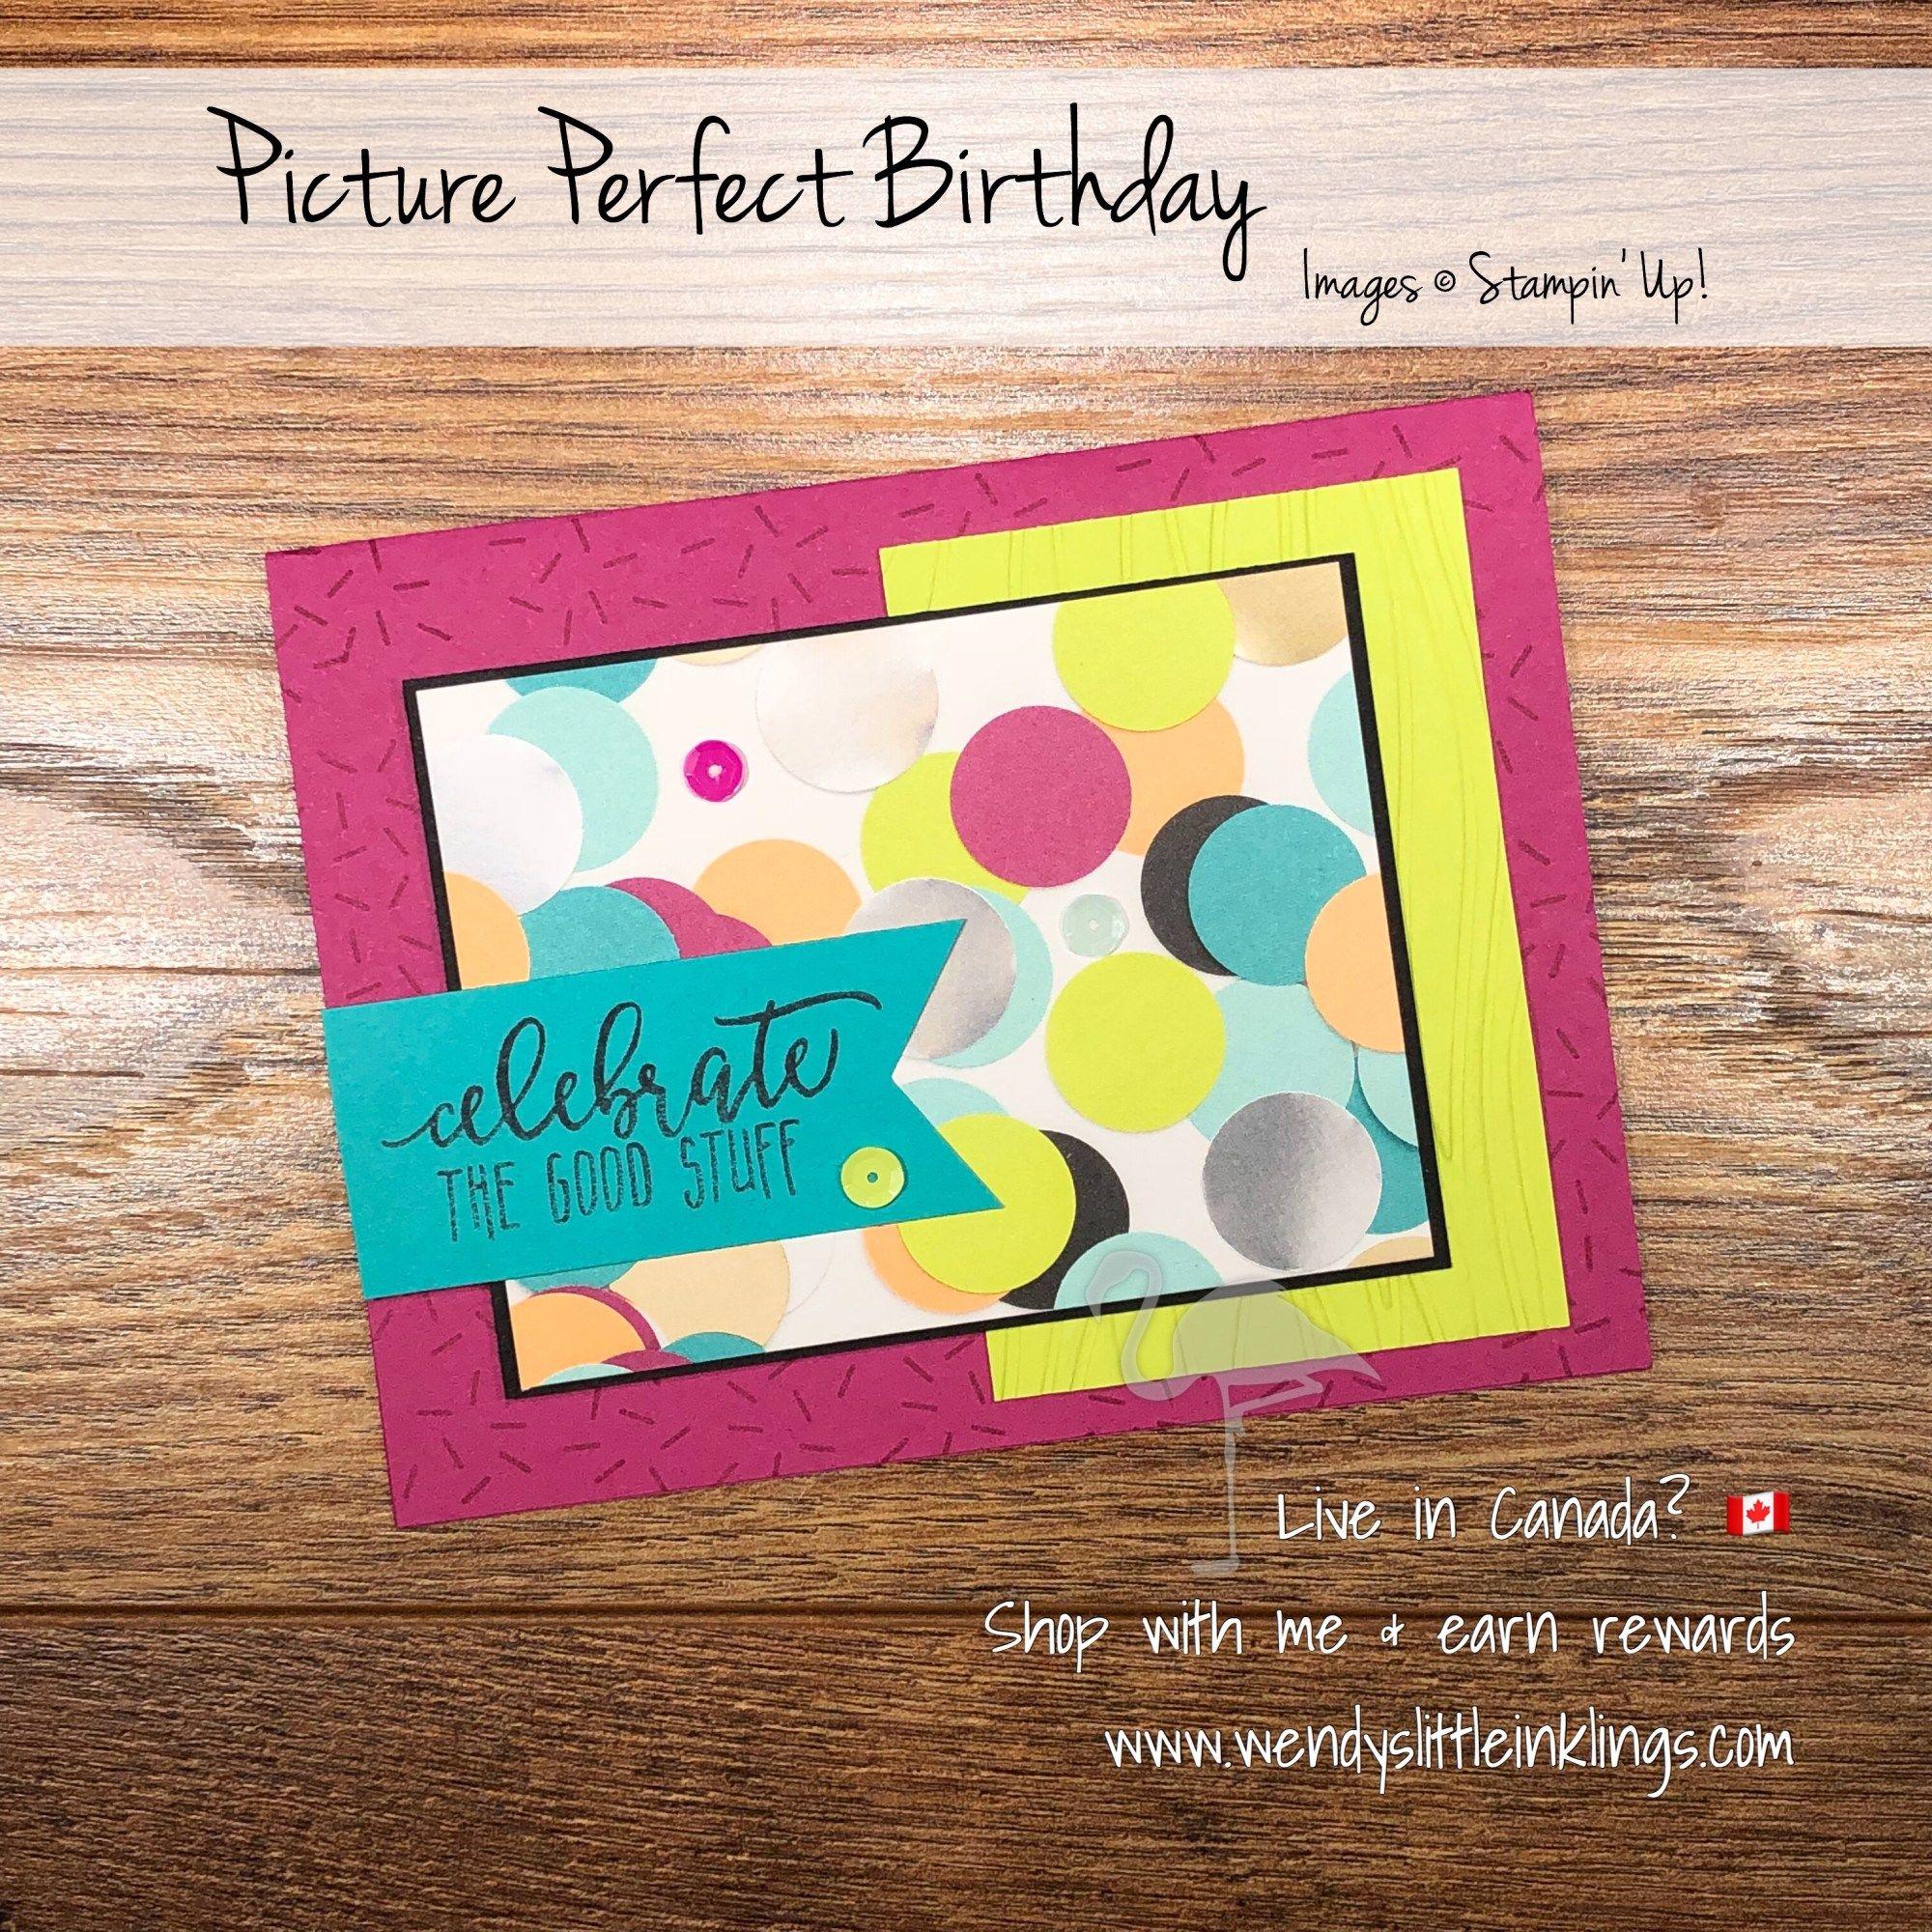 Card swap thursday picture perfect party suite cards